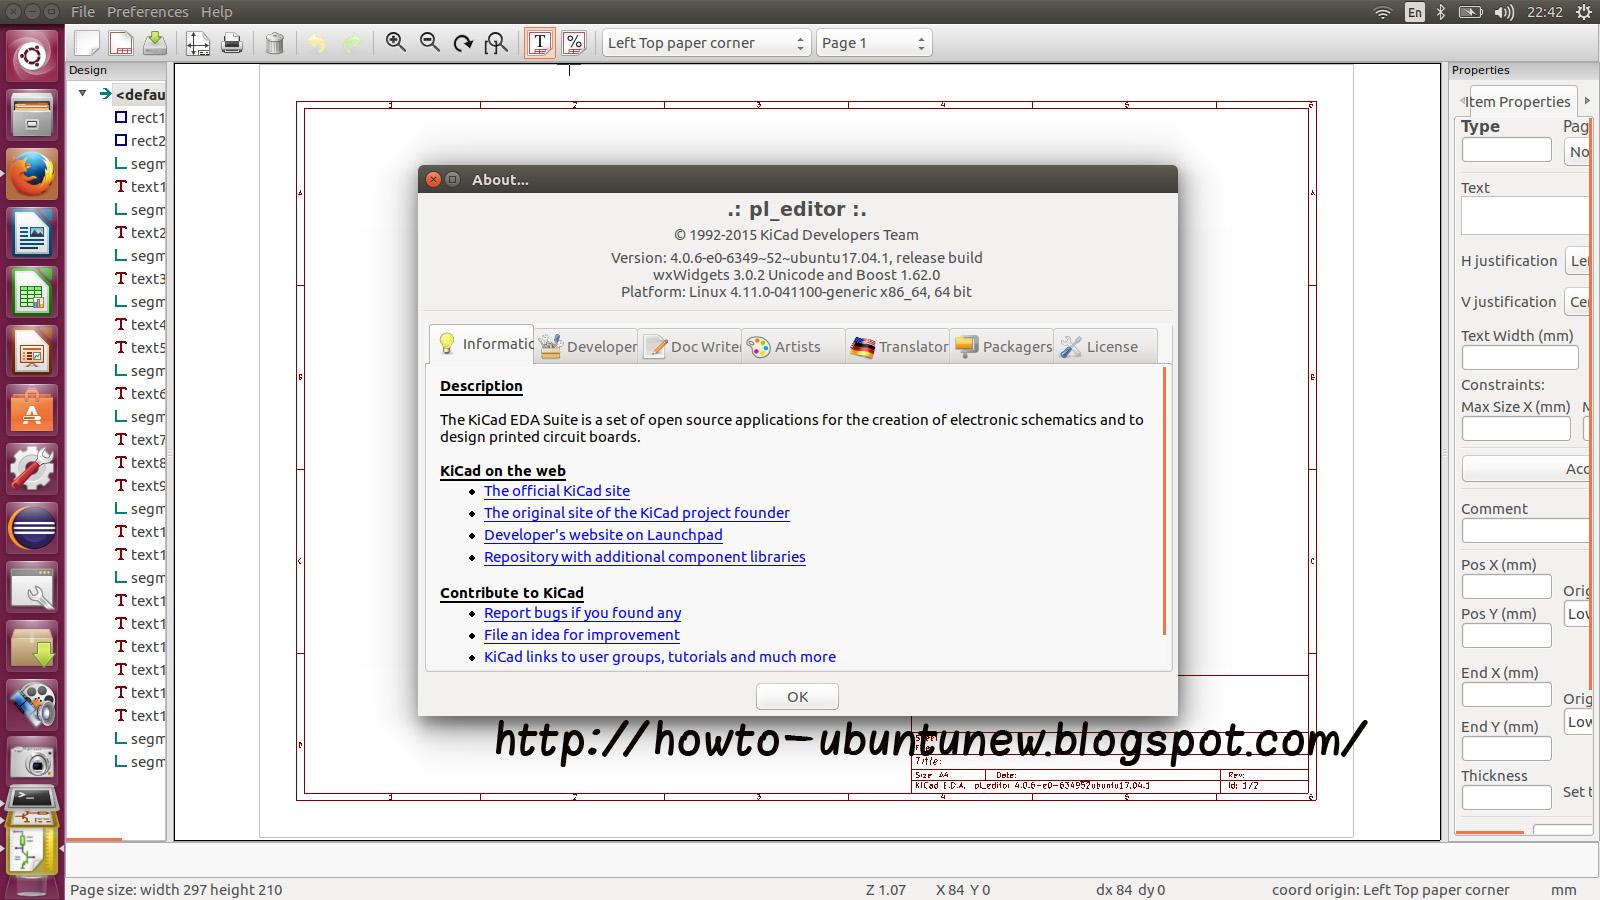 How to install program on Ubuntu: How to install KiCad EDA